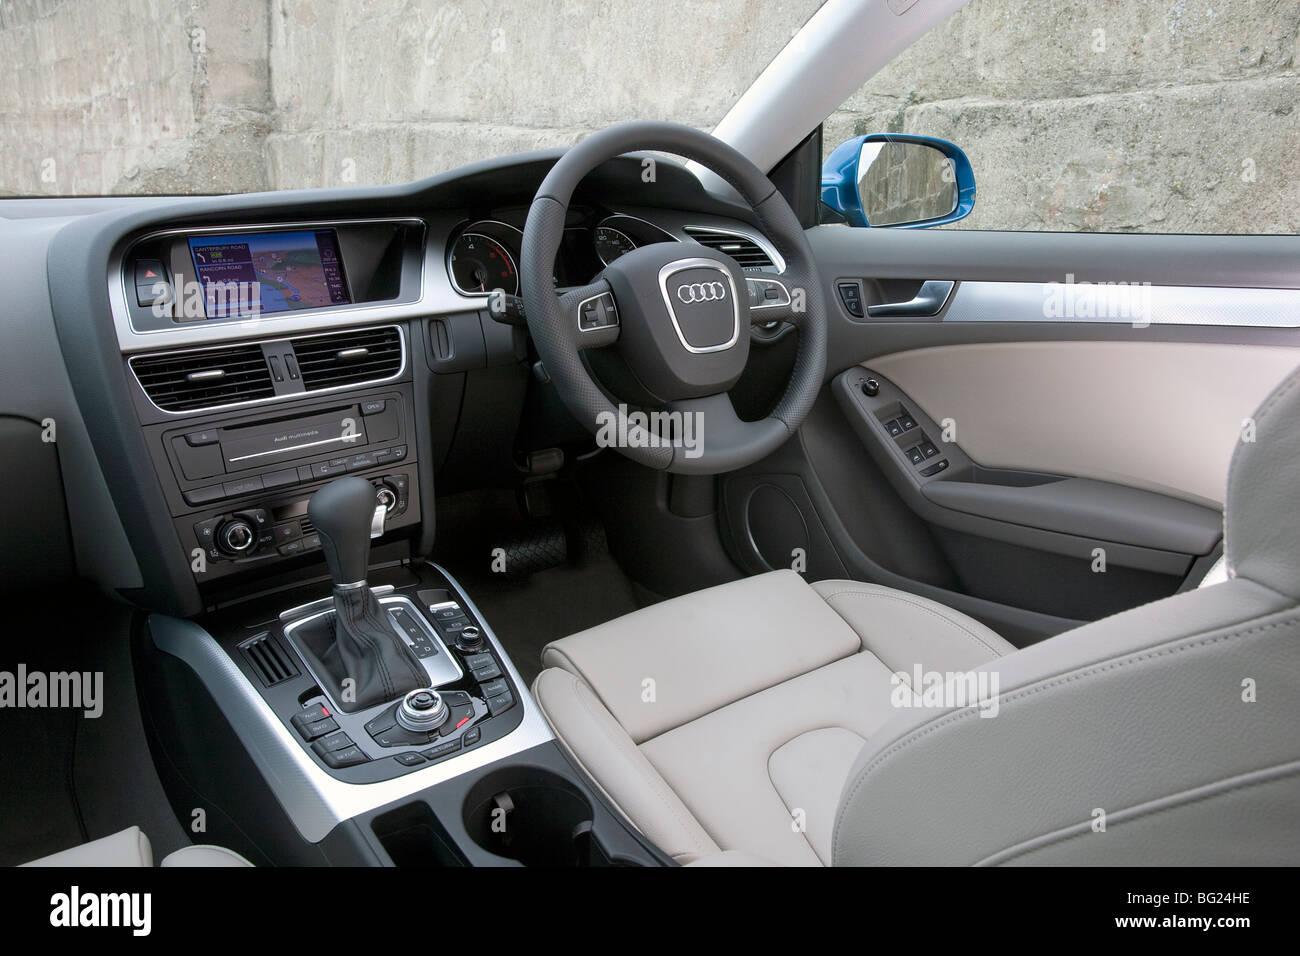 Audi A5 Sportback Interieur Stockfoto, Bild: 27092394 - Alamy